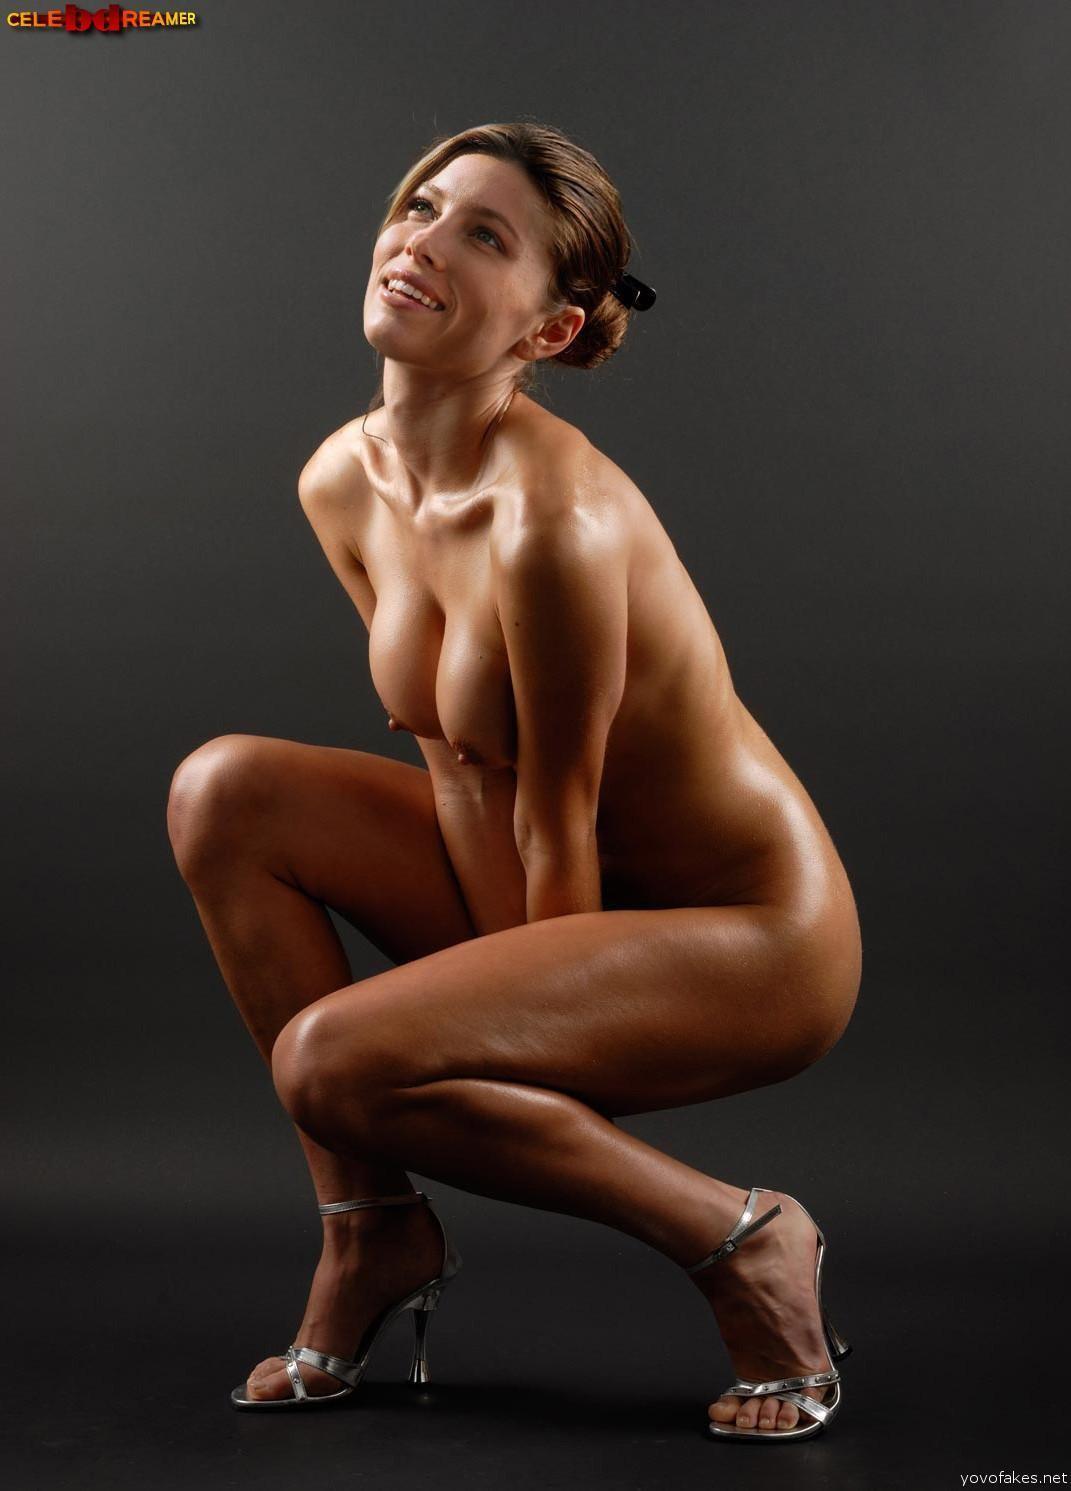 jessica beal celeb sex video